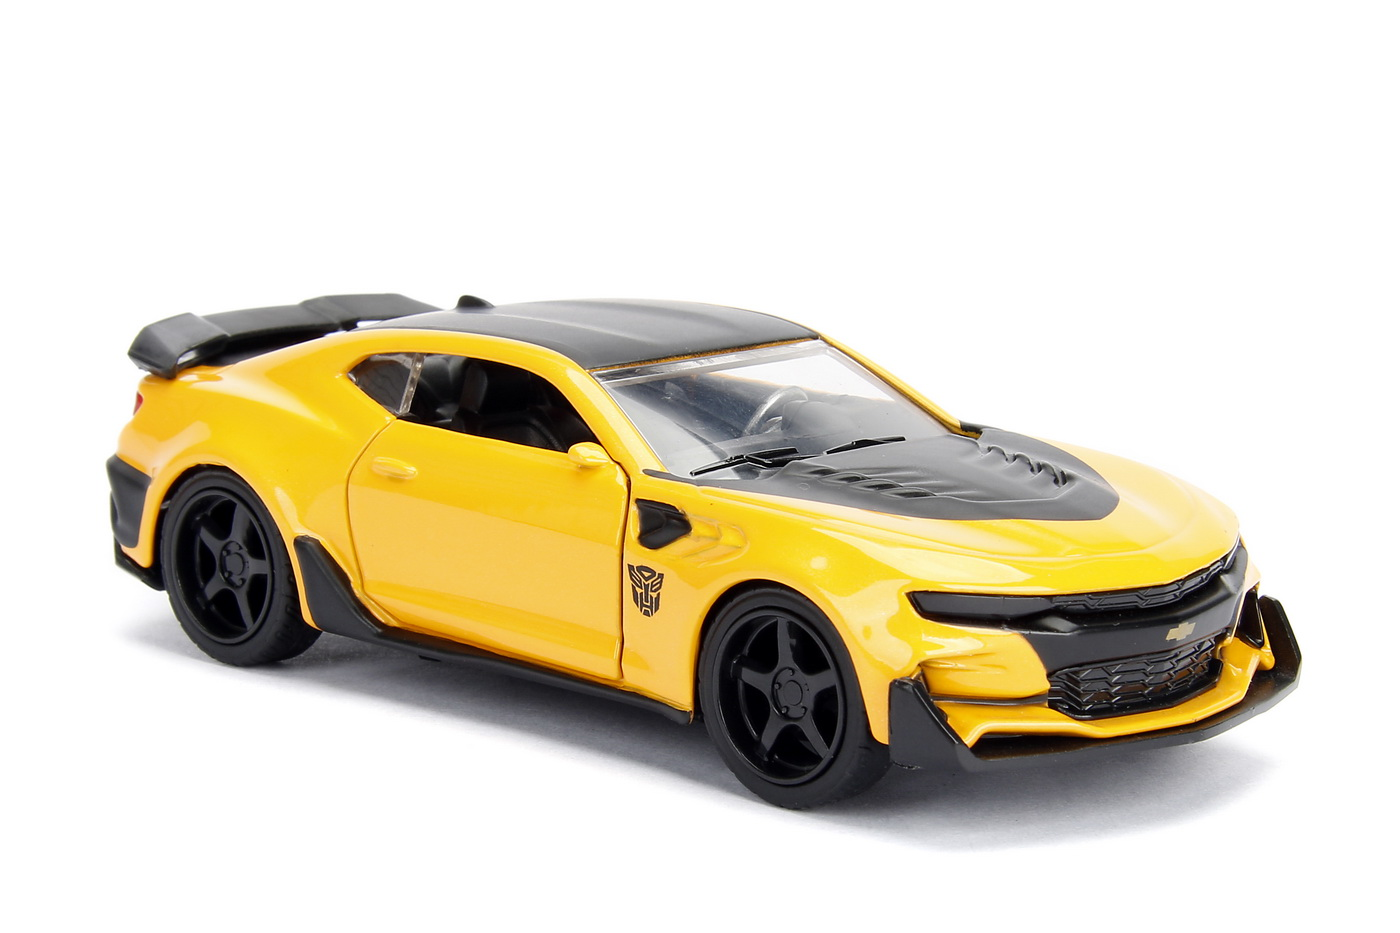 Masinuta Metalica Transformers 2016 Chevy Camaro Scara 1 La 32   JadaToys - 5